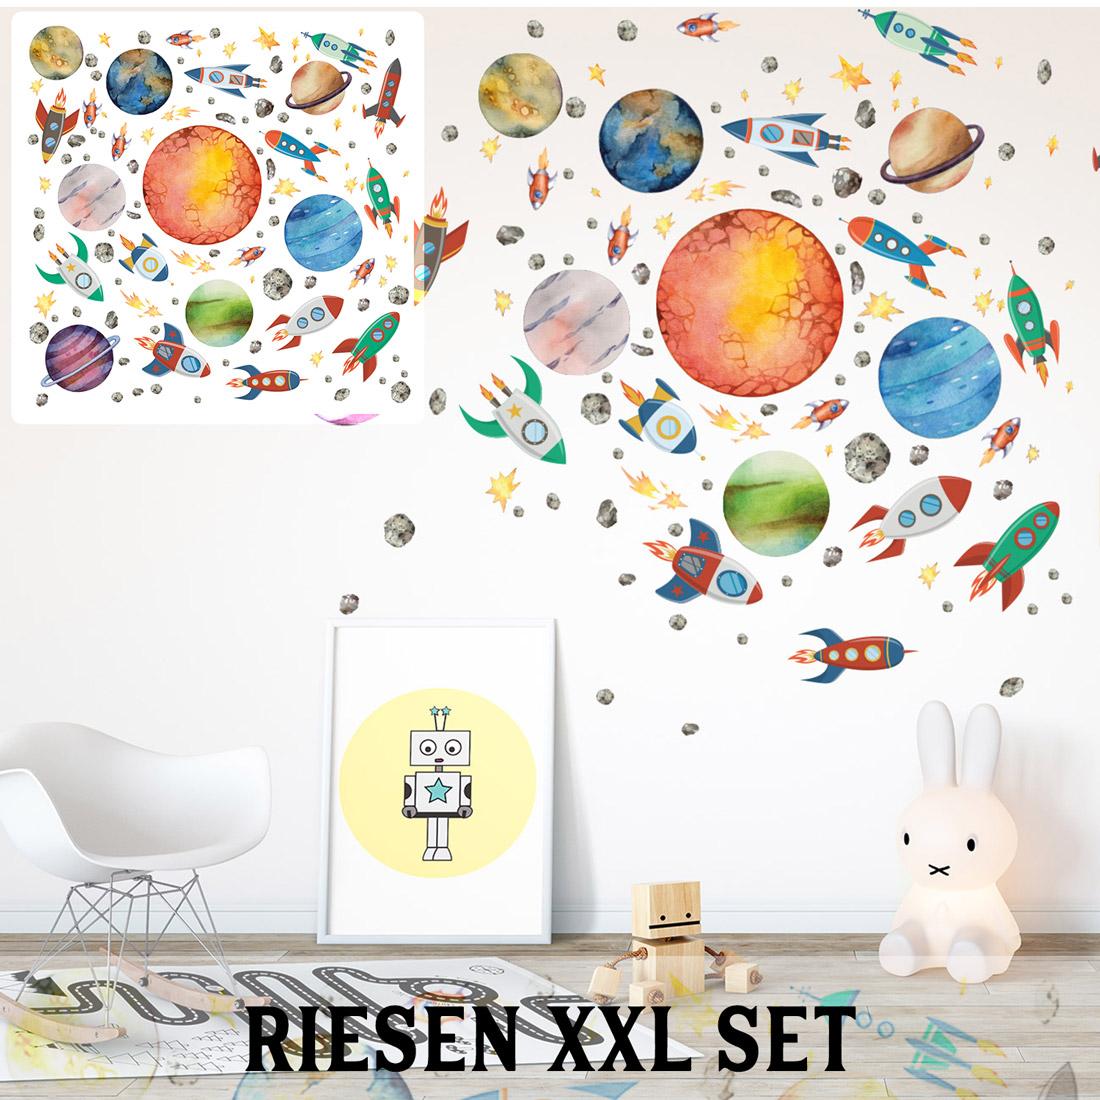 Weltraum Wandtattoo Xxl Set Verschiedene Motive Kinderzimmer Aufkleber Bunt Wanddeko Sunnywall Online Shop